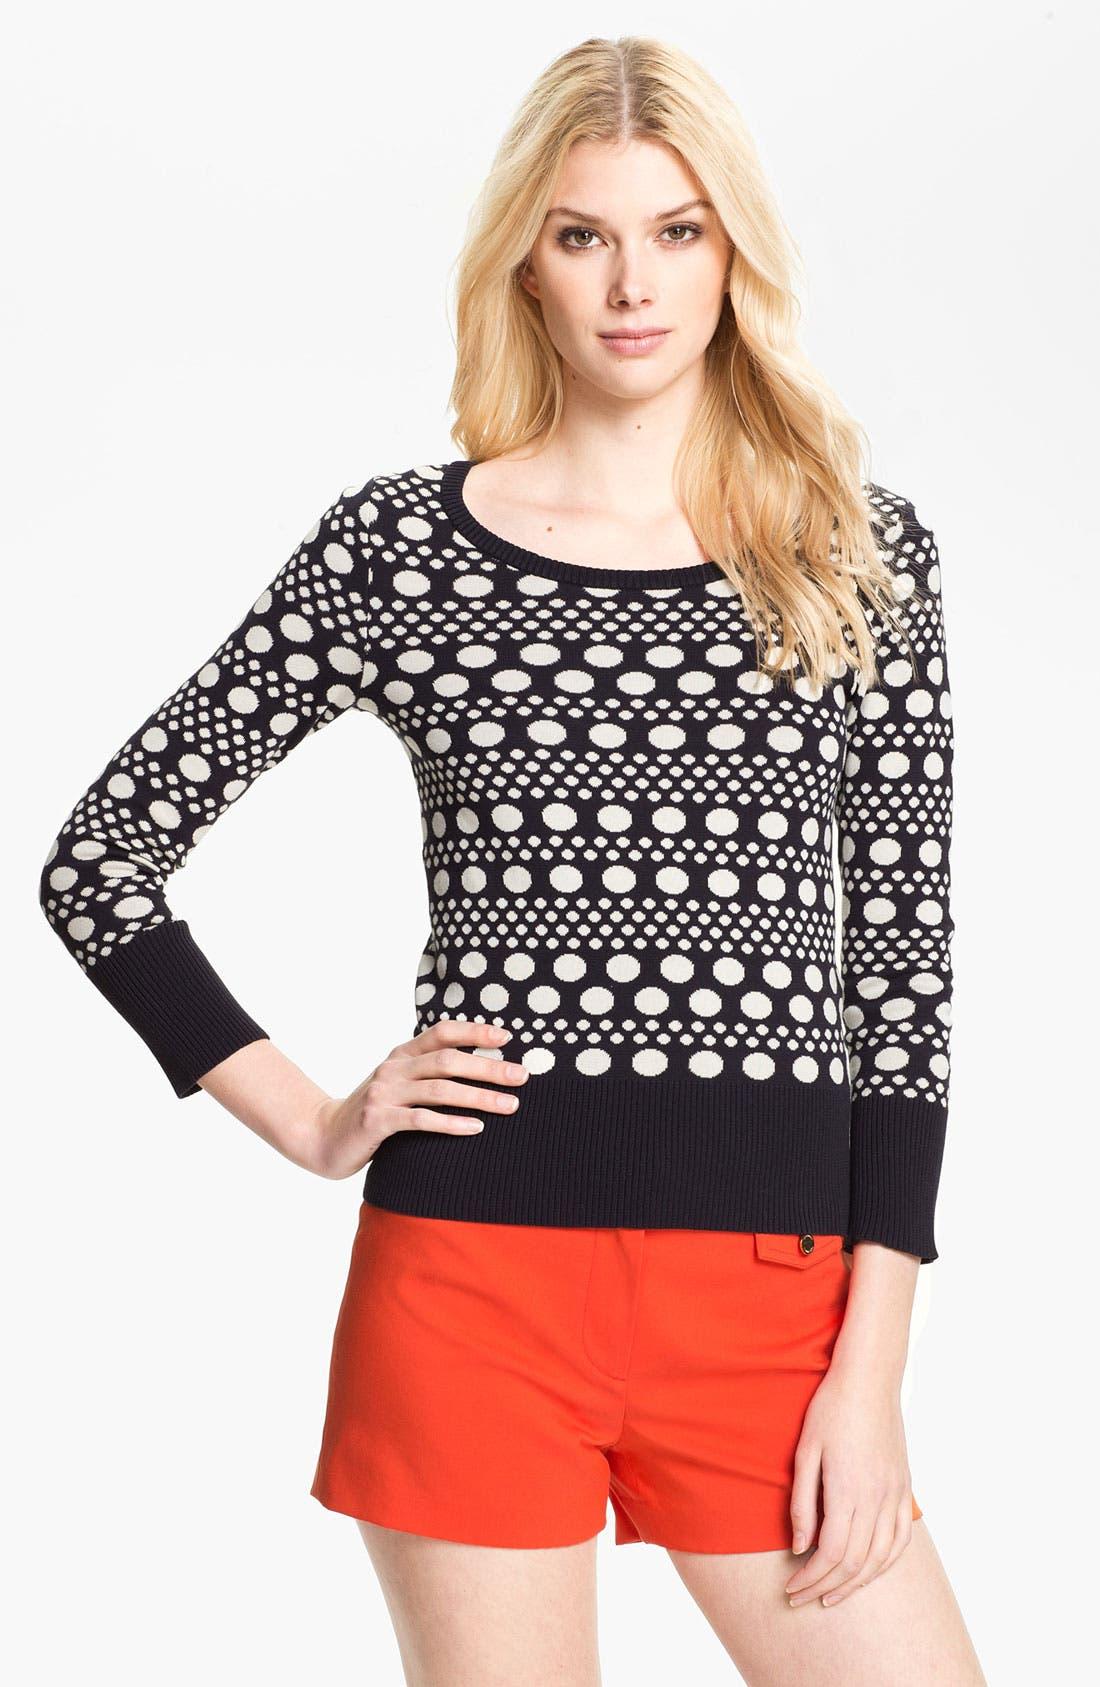 Main Image - Tory Burch 'Falon' Sweater